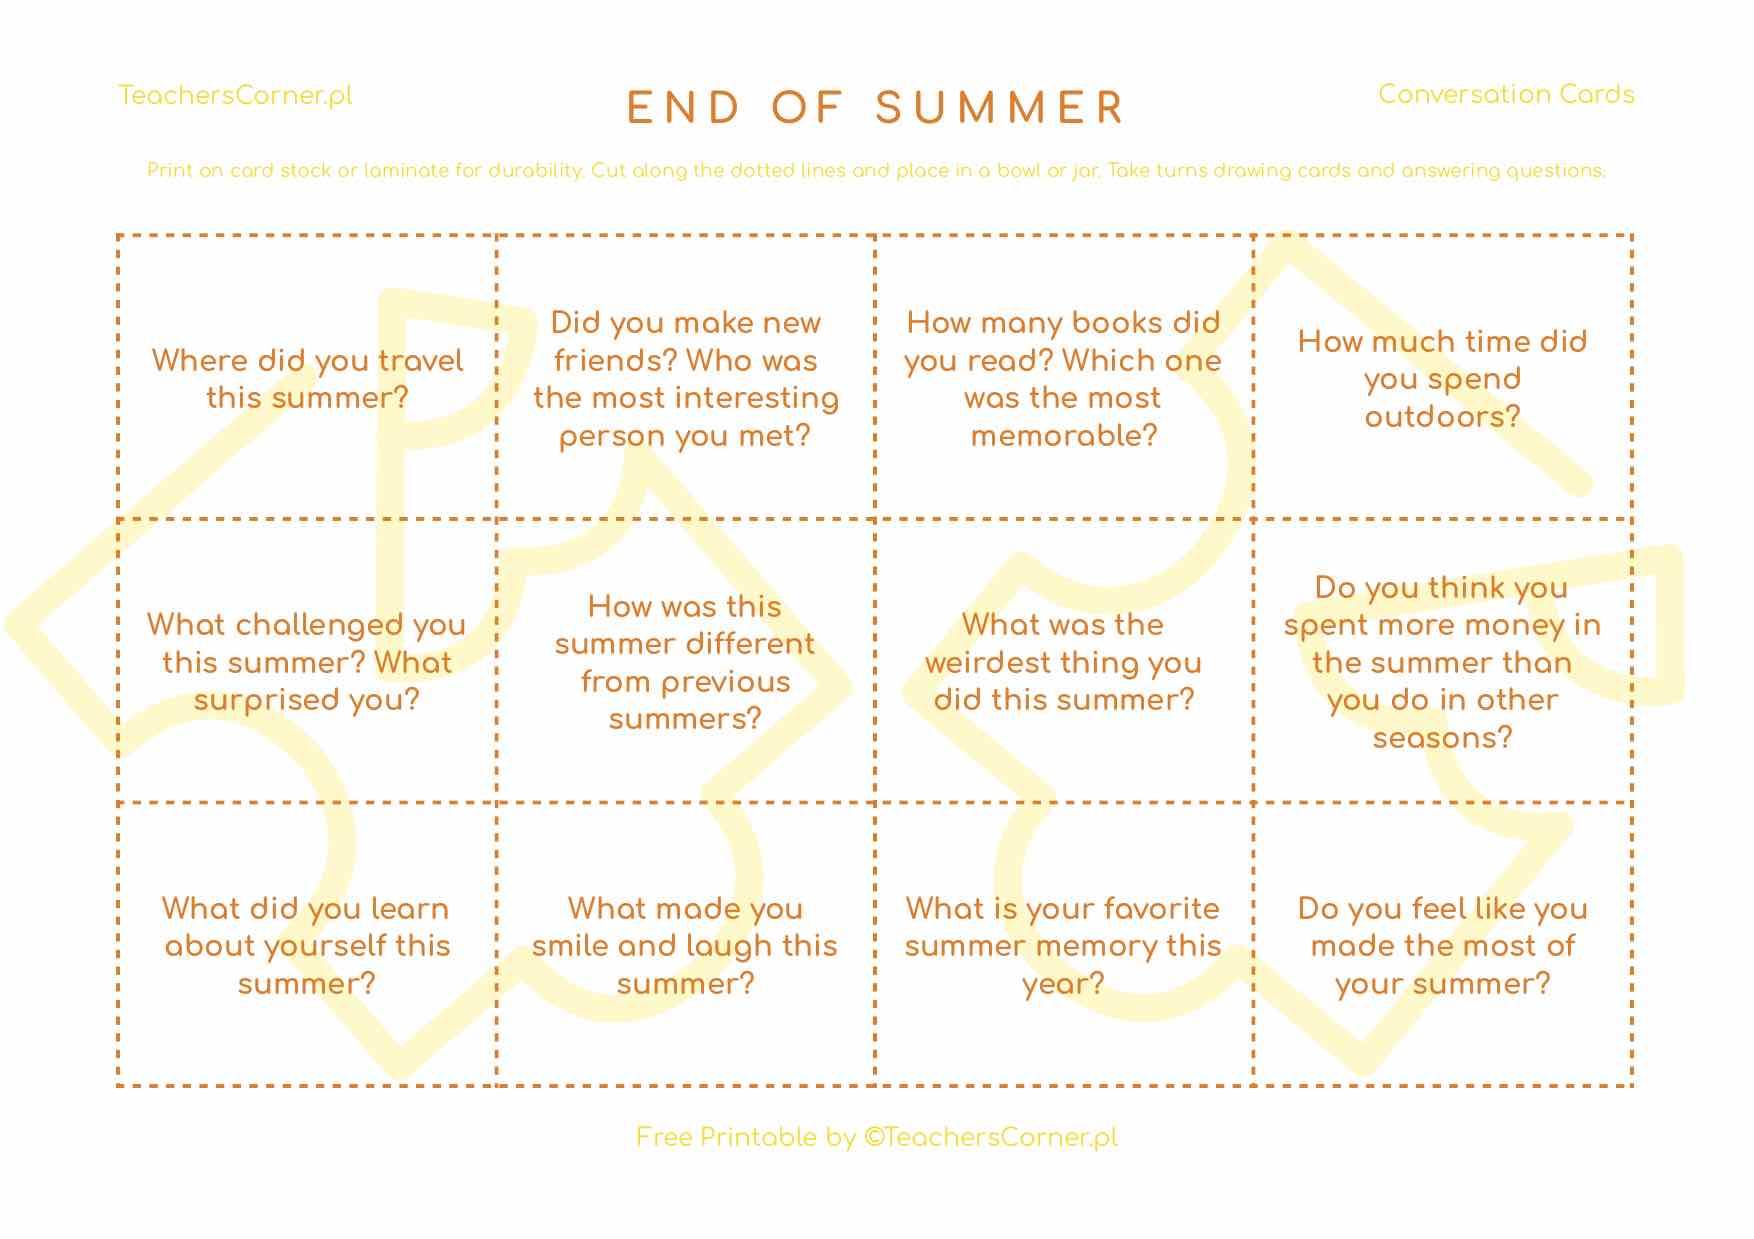 karty konwersacyjne End of Summer